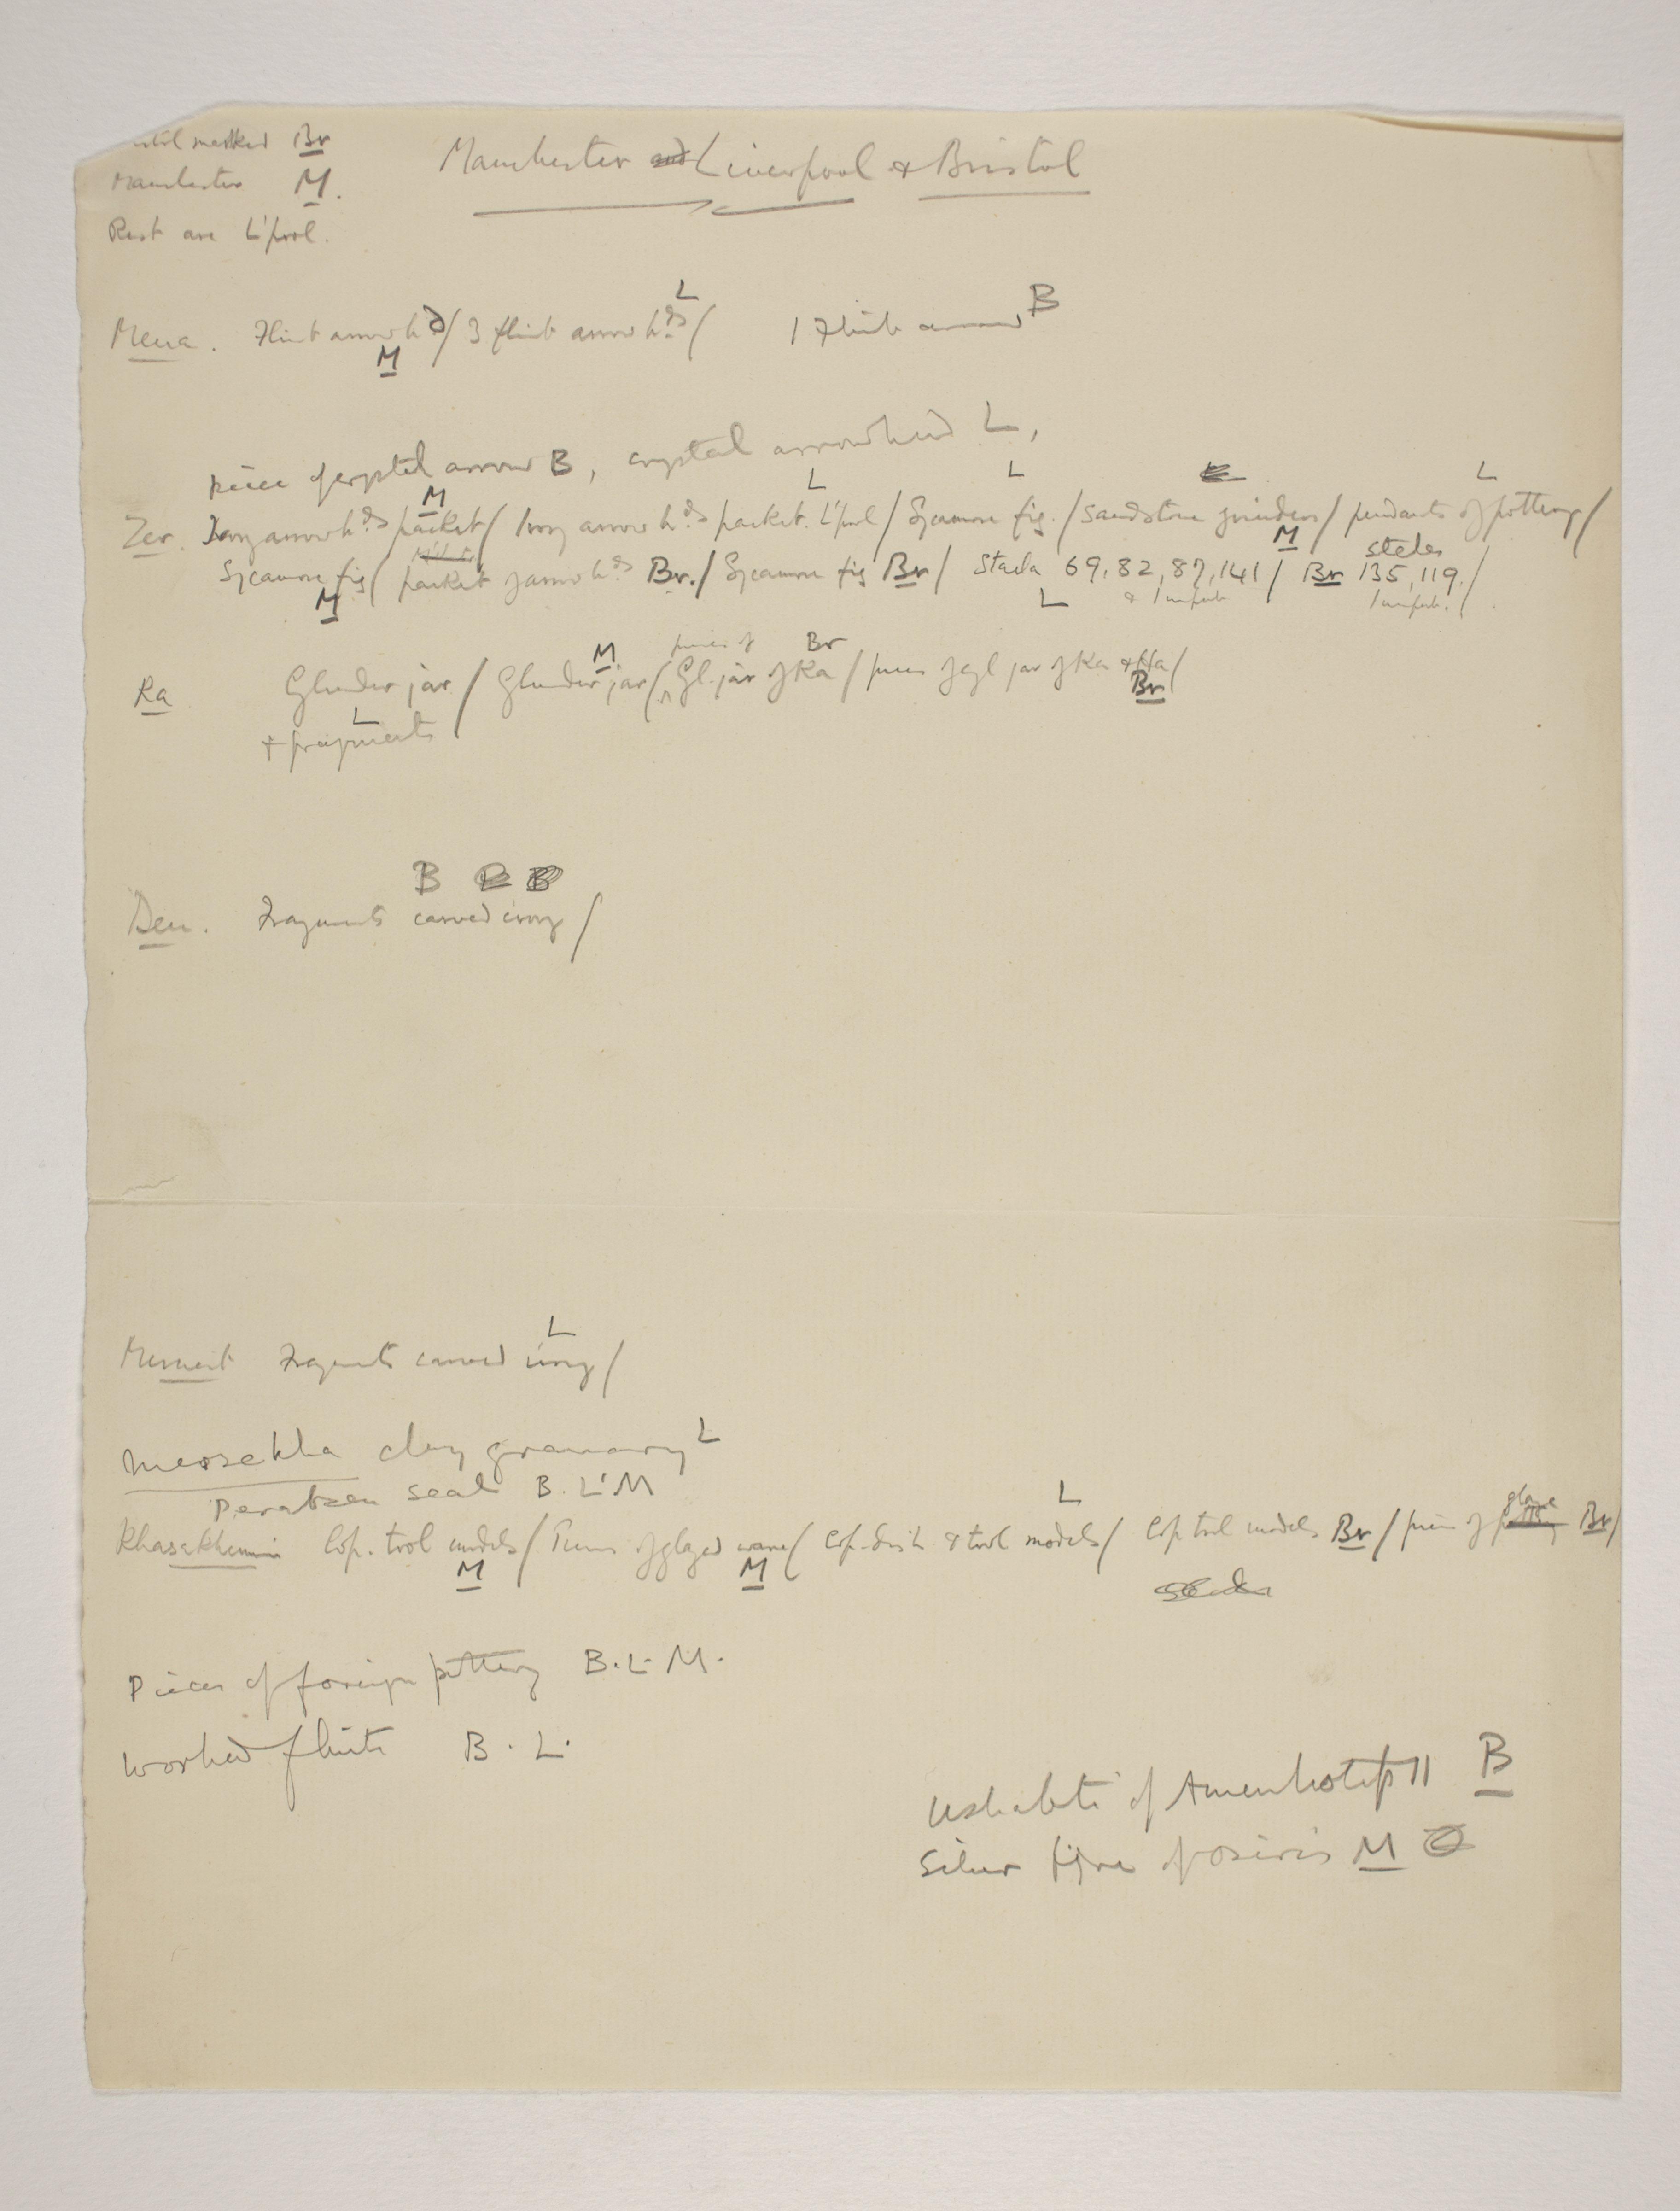 1900-01 Abydos, Bet Khallaf, el-Mahasna Multiple institution list PMA/WFP1/D/9/26